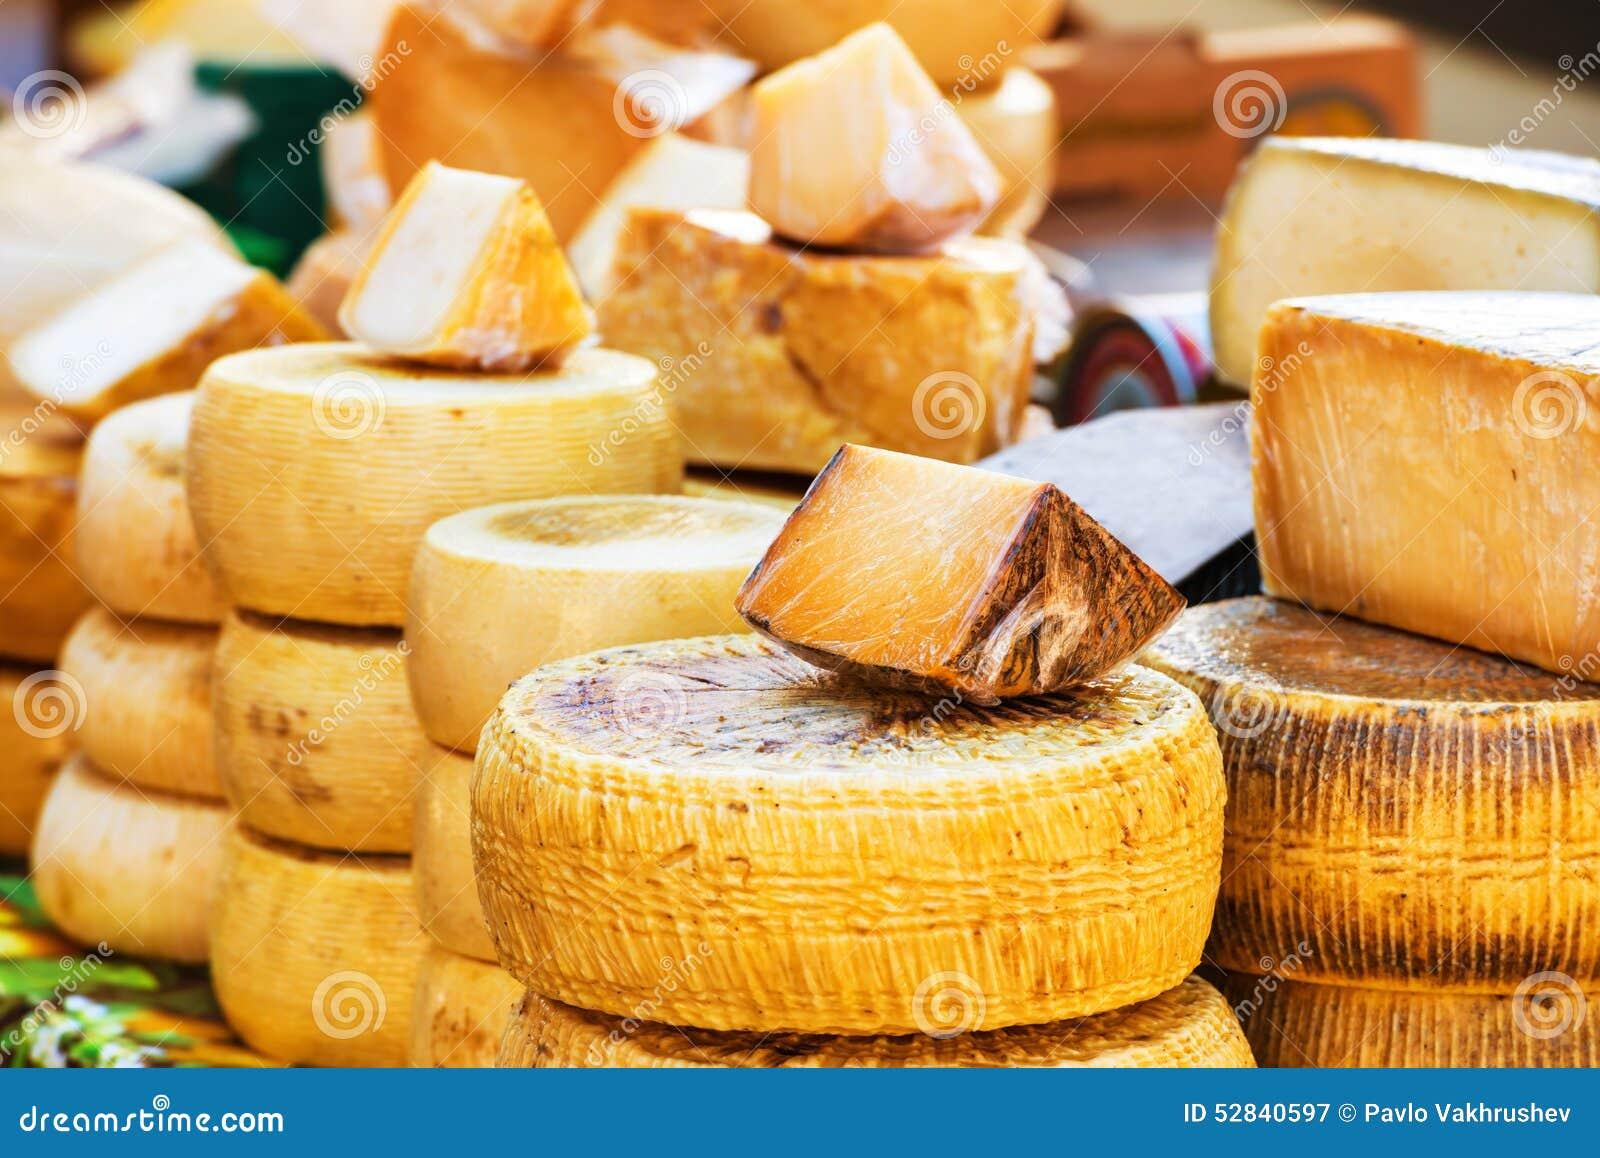 diff rentes sortes de fromage italien photo stock image. Black Bedroom Furniture Sets. Home Design Ideas